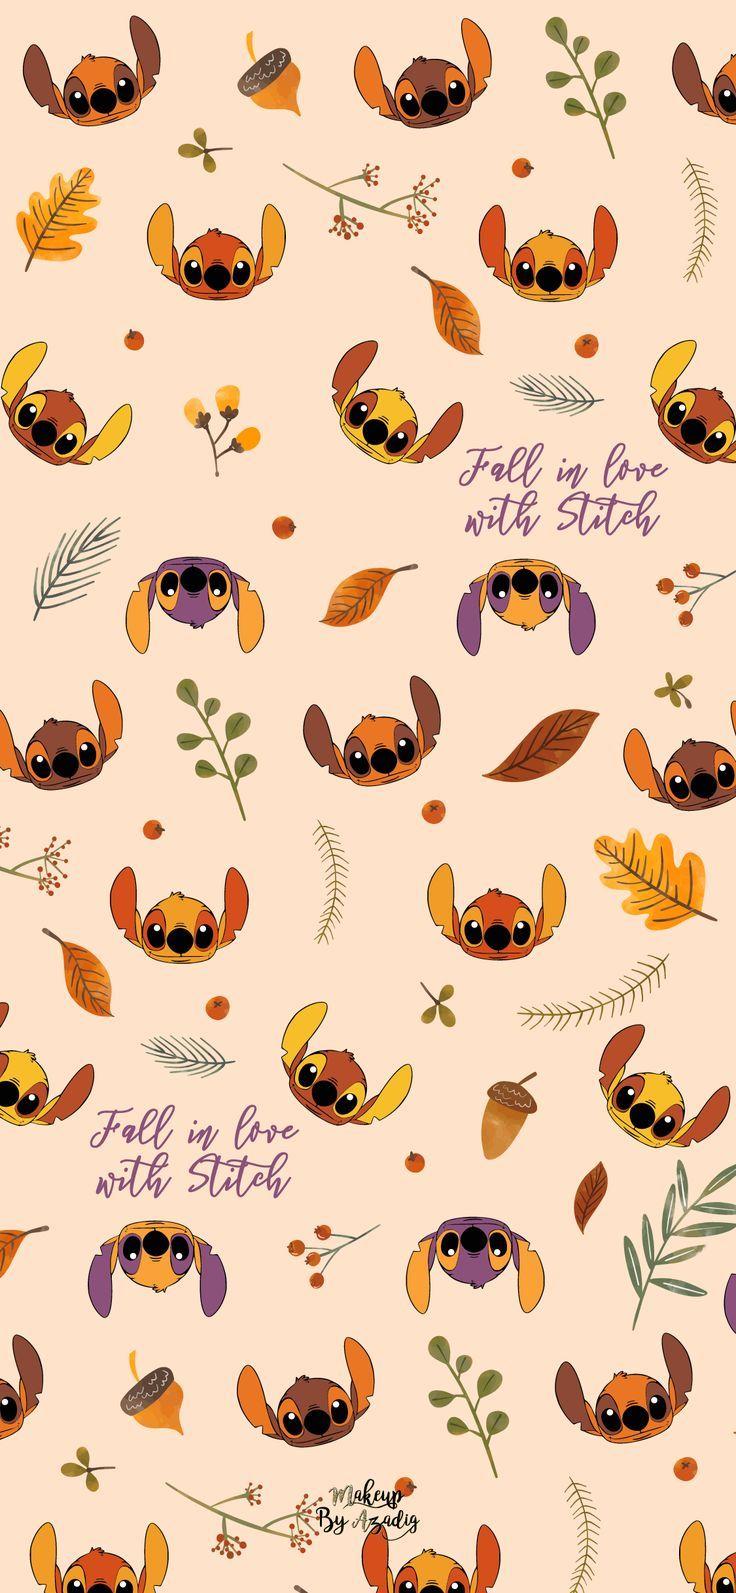 #8 : Fond d'écran Disney Stitch Fall - #Aestheticwallpaperiphone #Backgroundsiphone #Cu ...